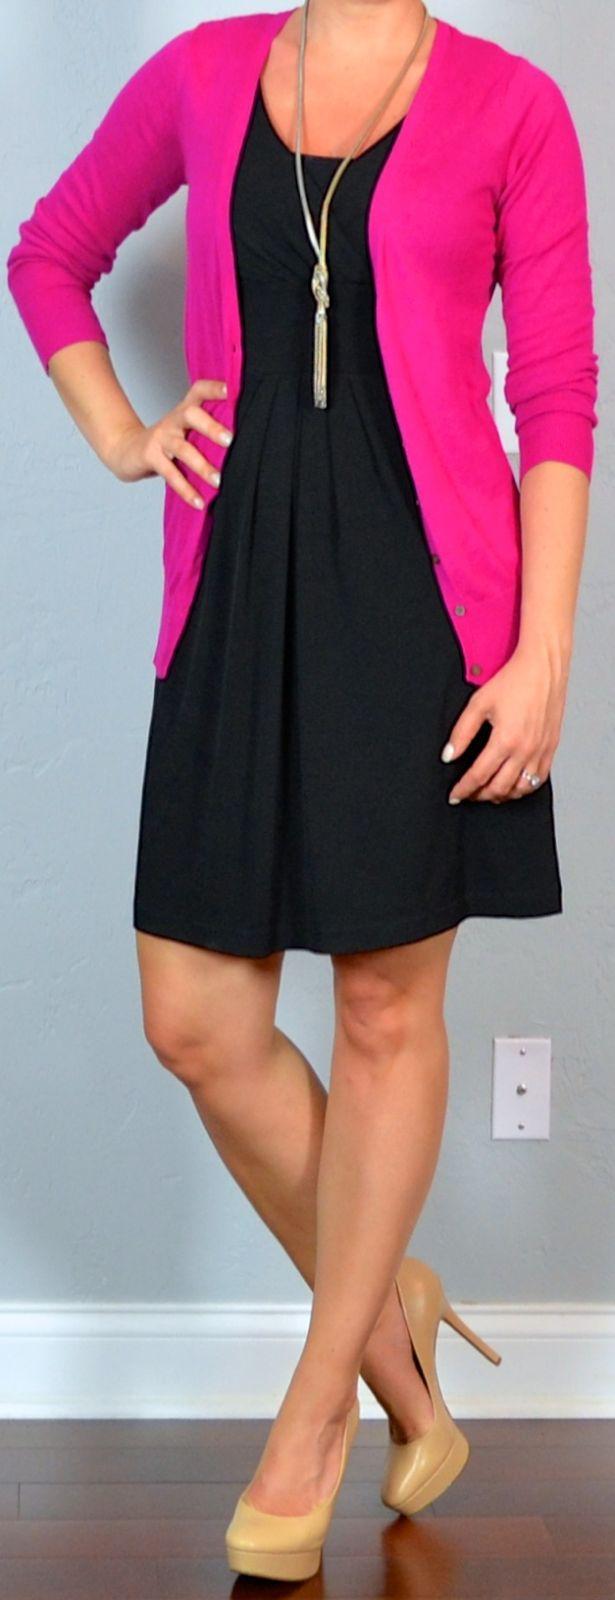 outfit post twofer: black dress, pink cardigan, nude pumps & black suit, burgundy camp shirt, black pumps | Outfit Posts